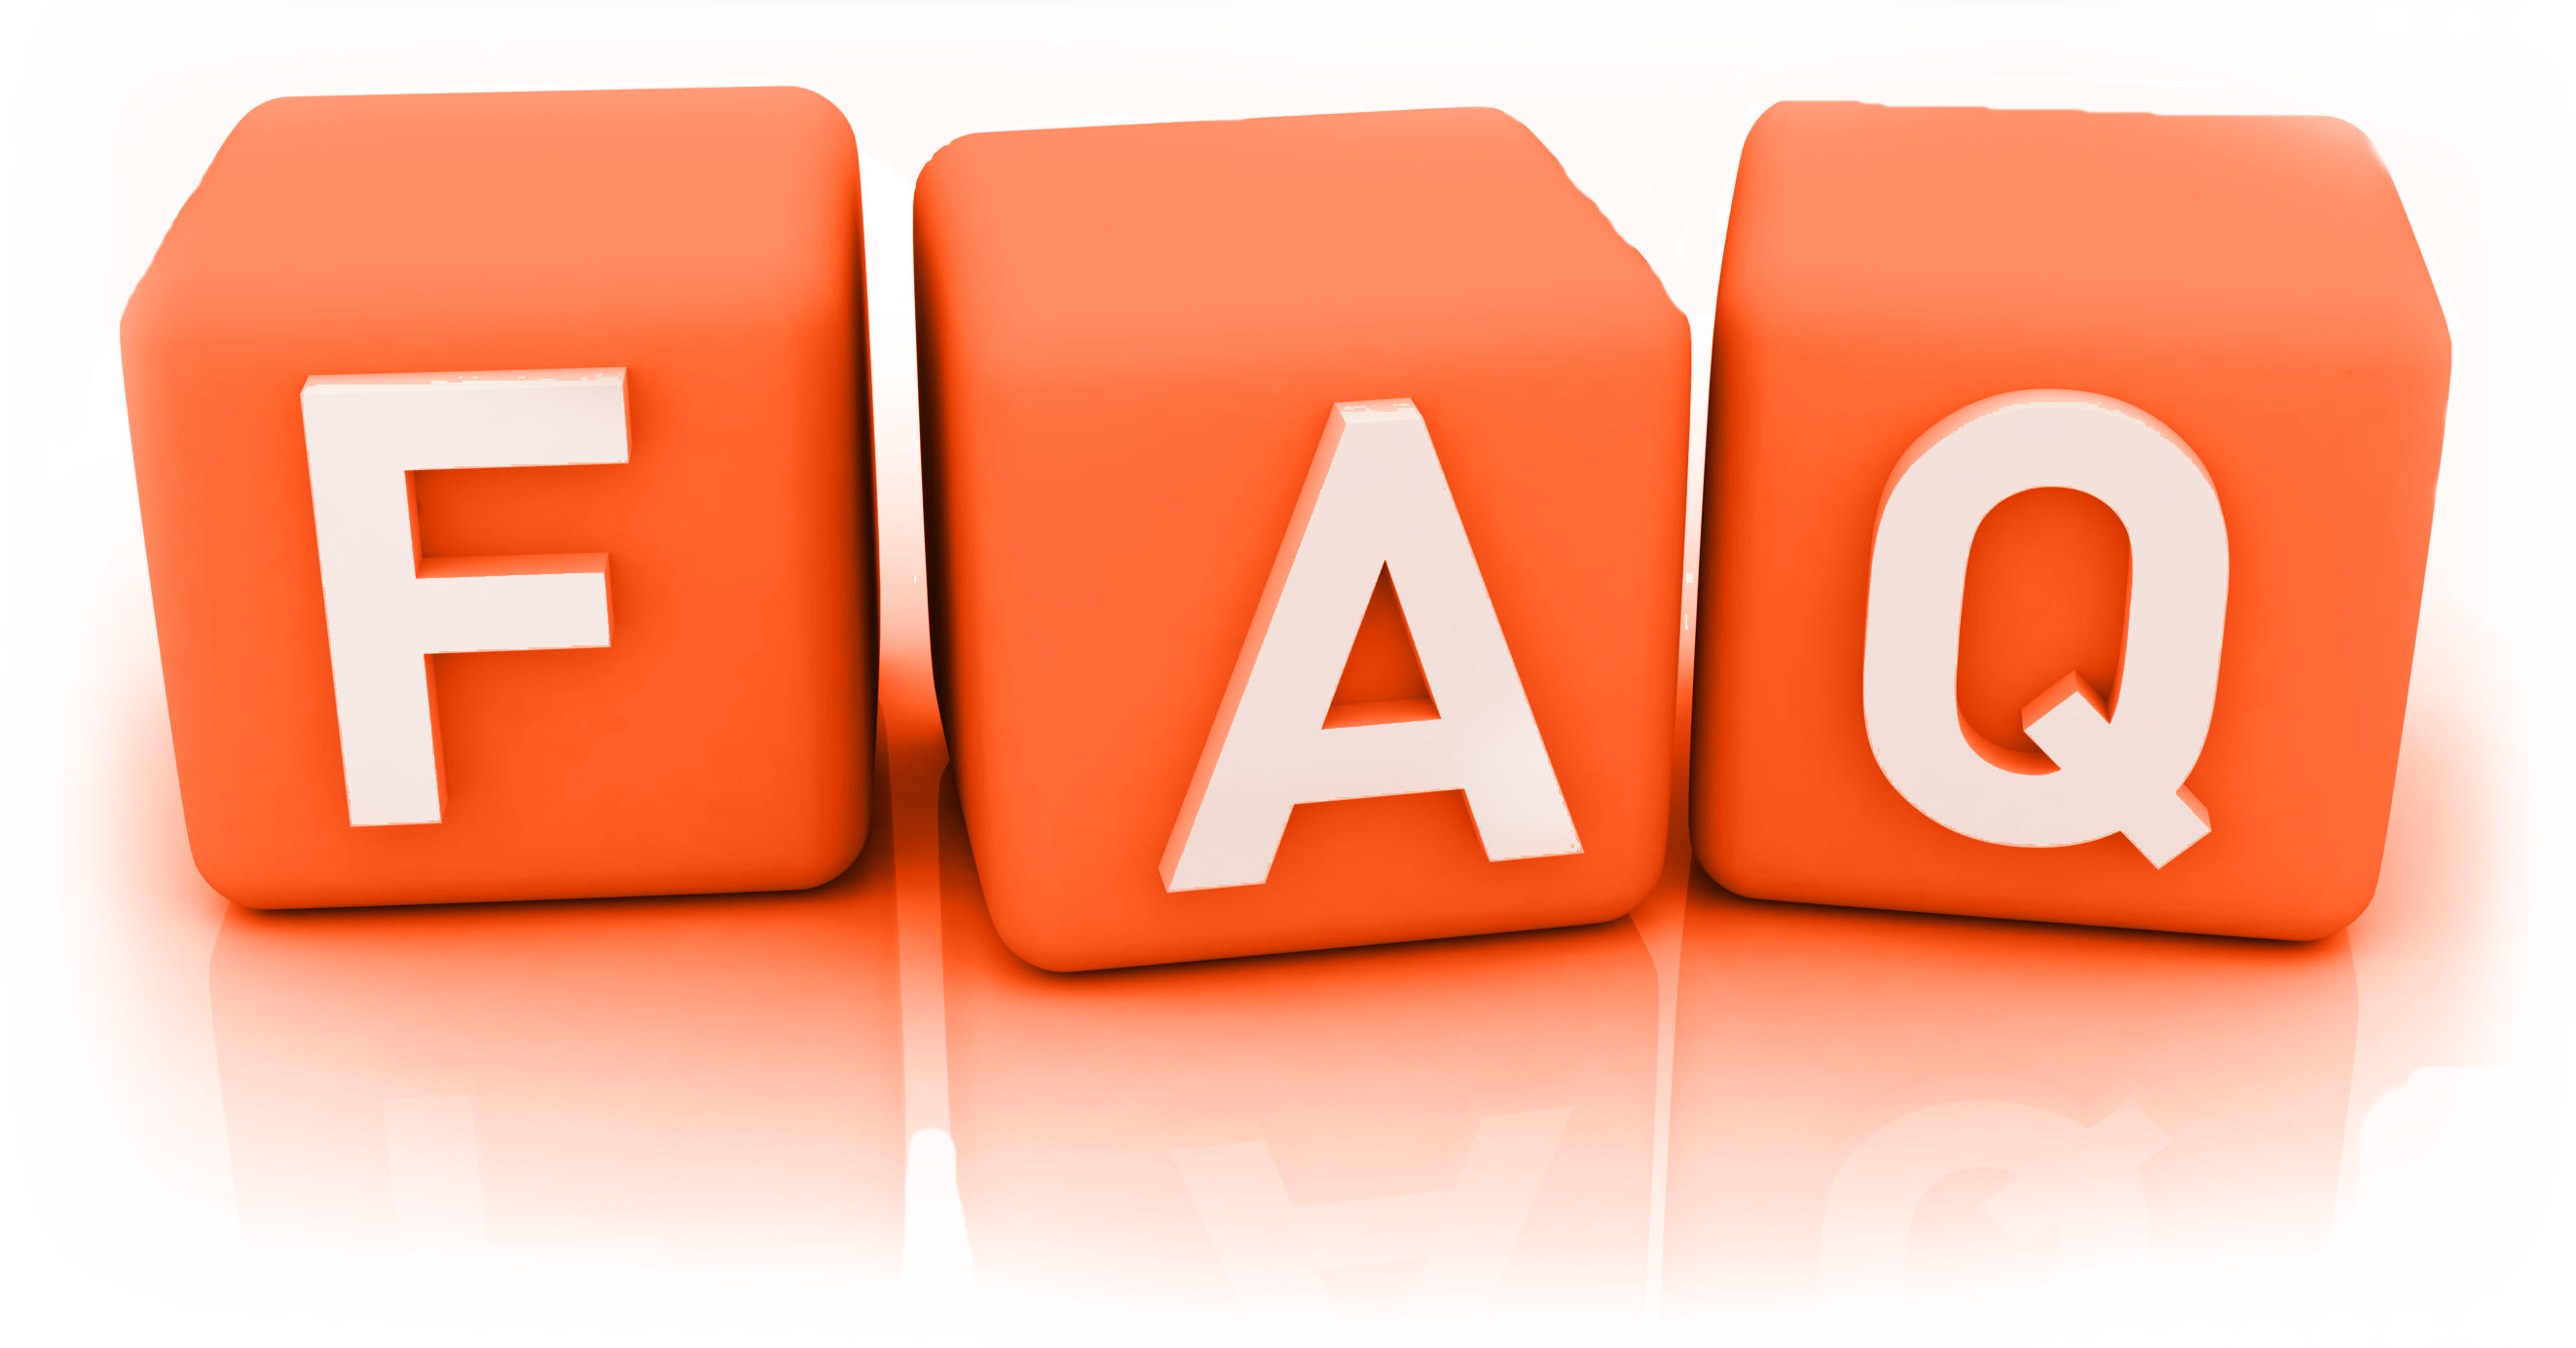 FAQ-orange.png